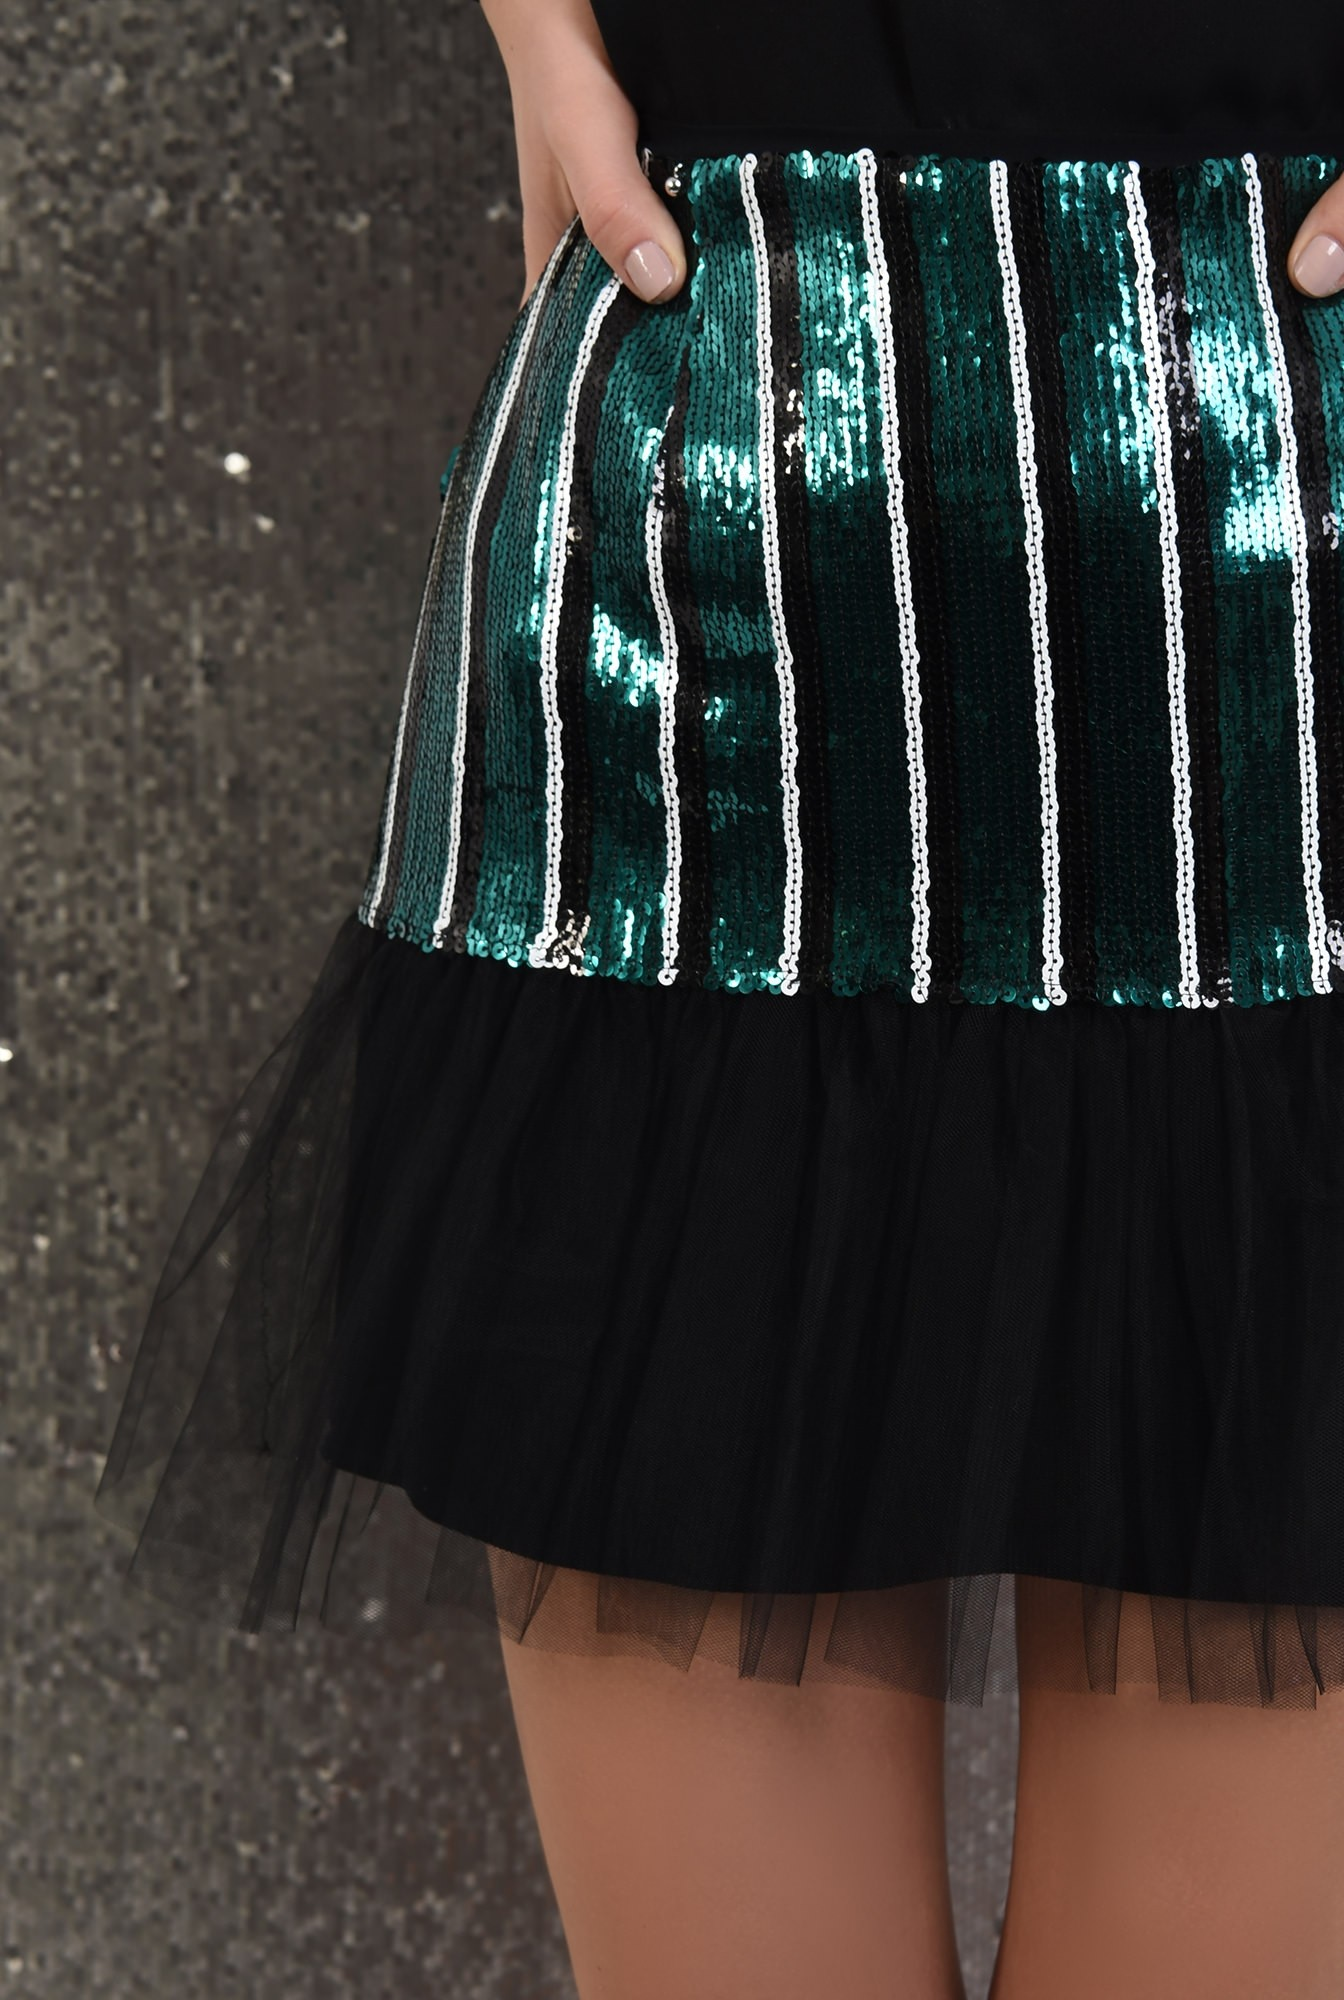 2 - 360 - fusta eleganta, cu paiete, franjuri, jupa din tul, Poema